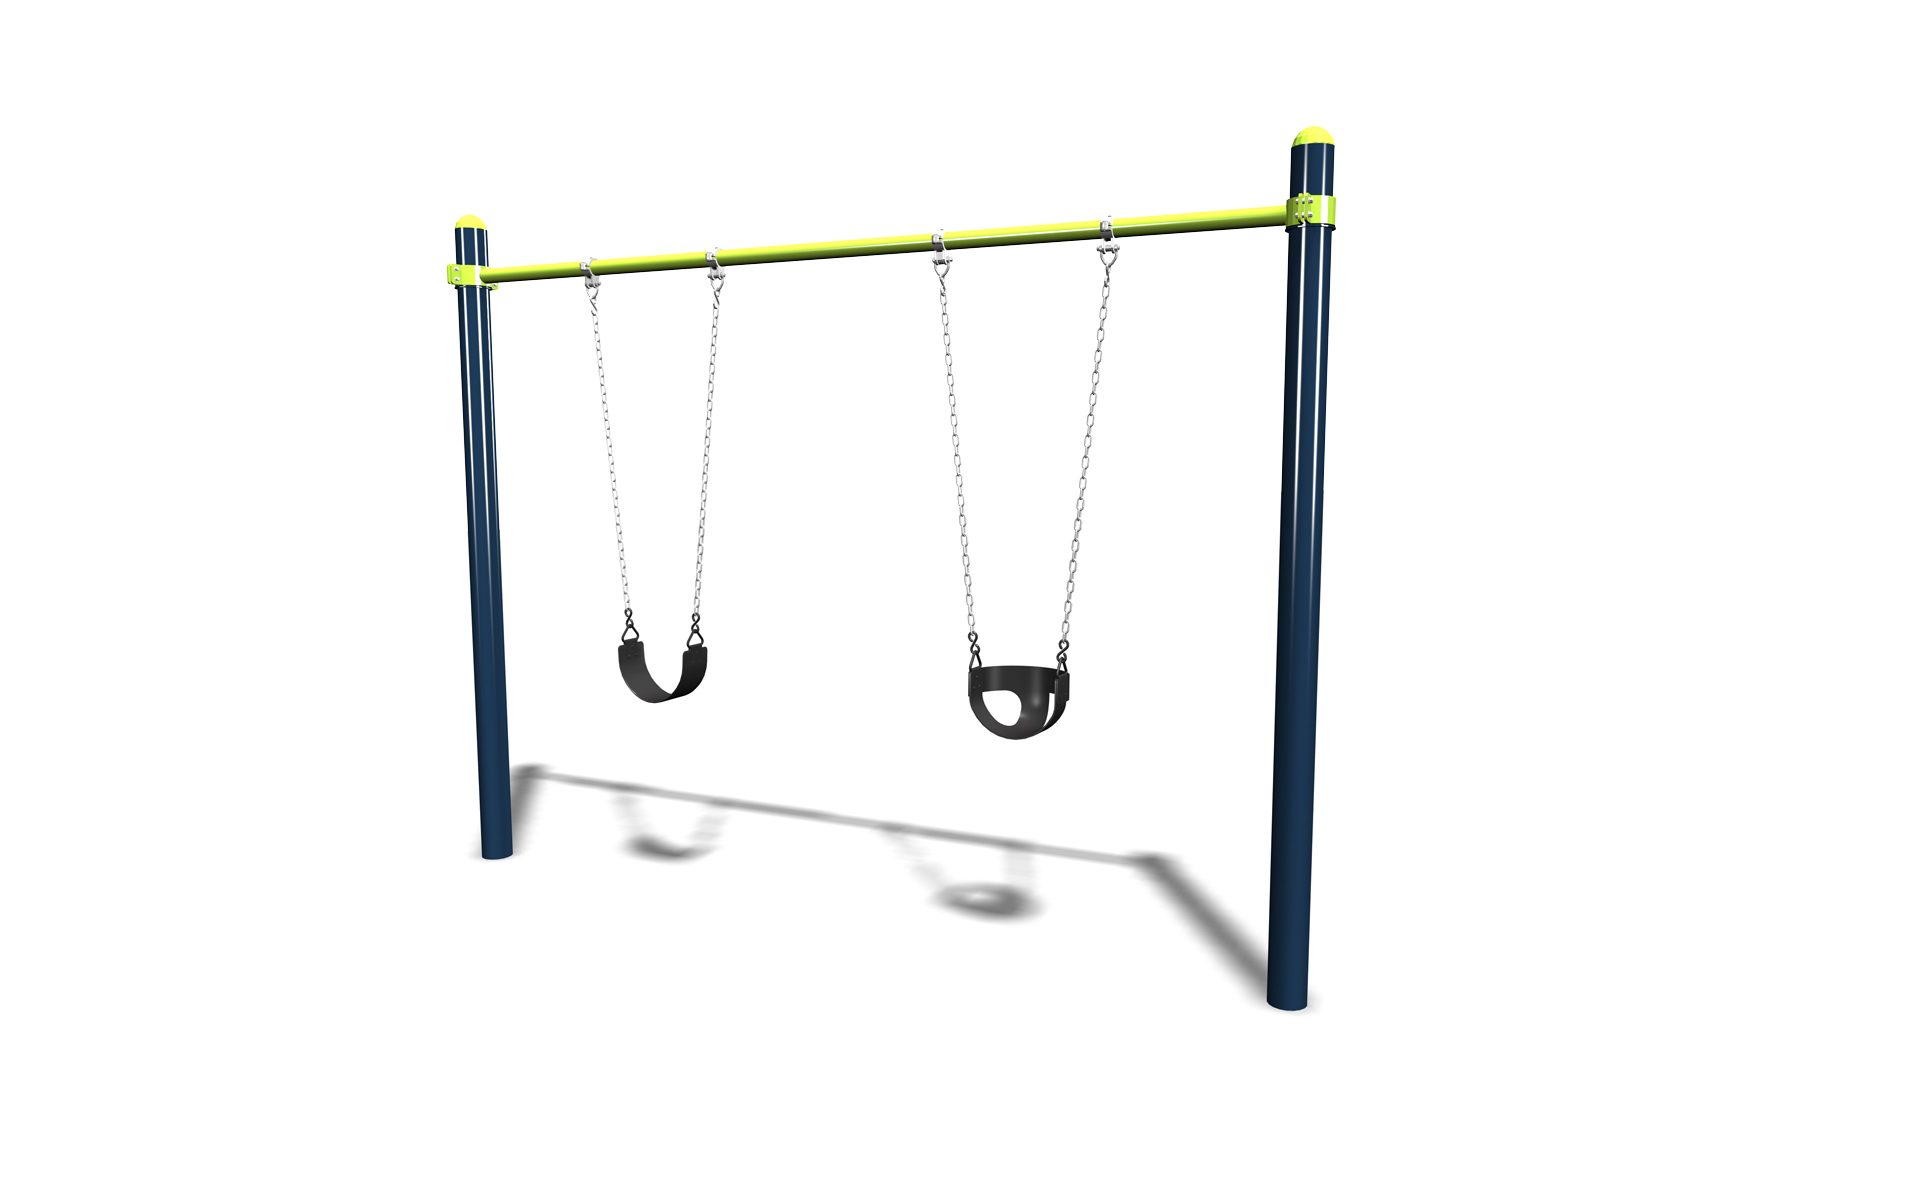 omni-swing-1-bay.jpg